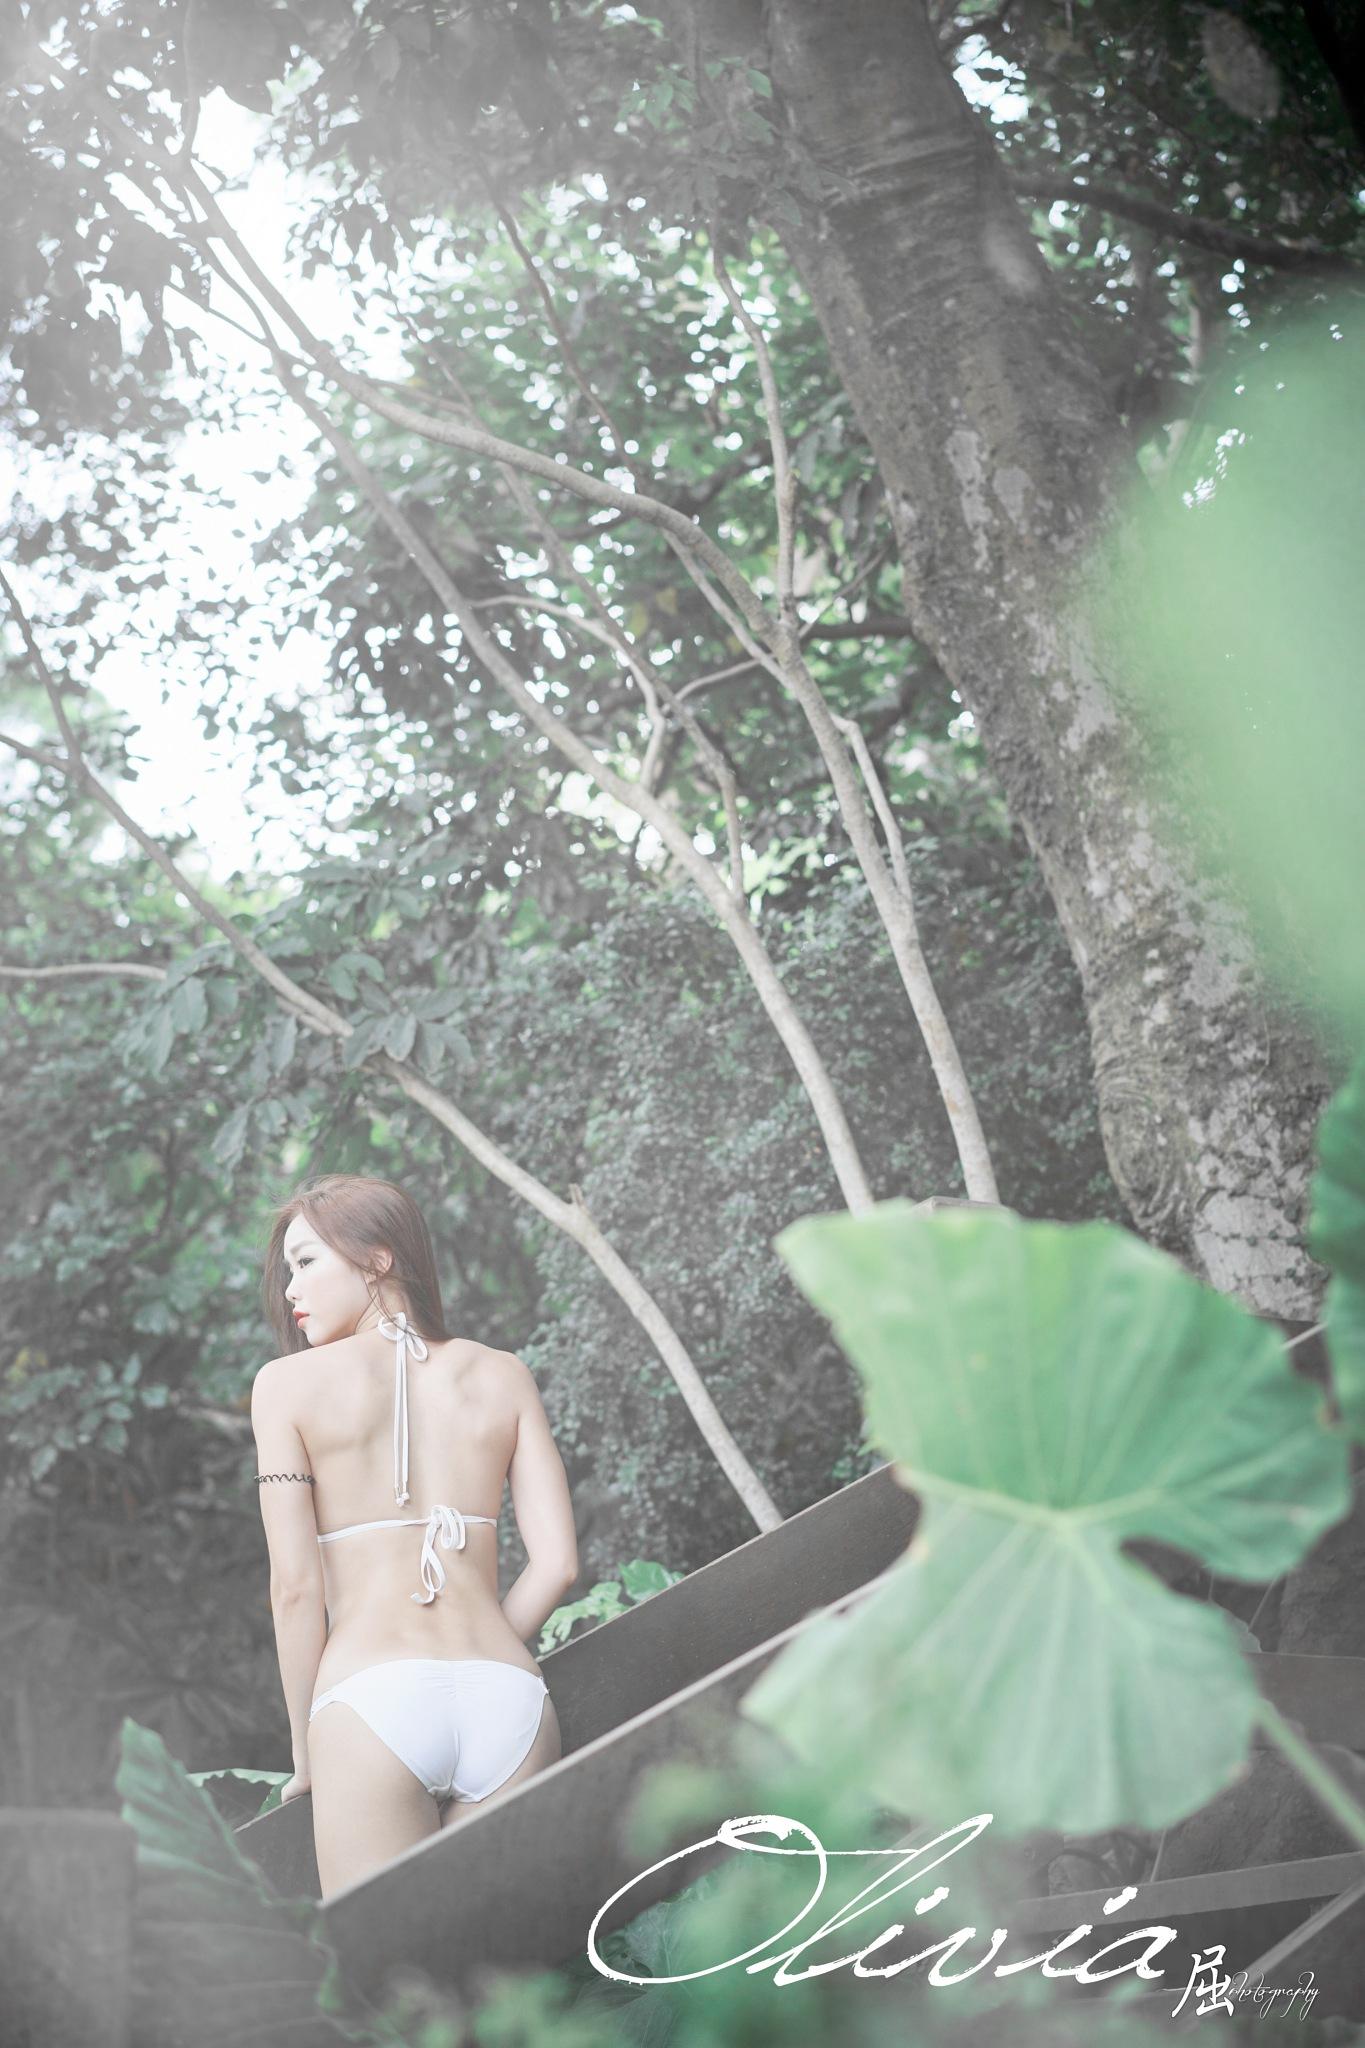 Untitled by norikop629